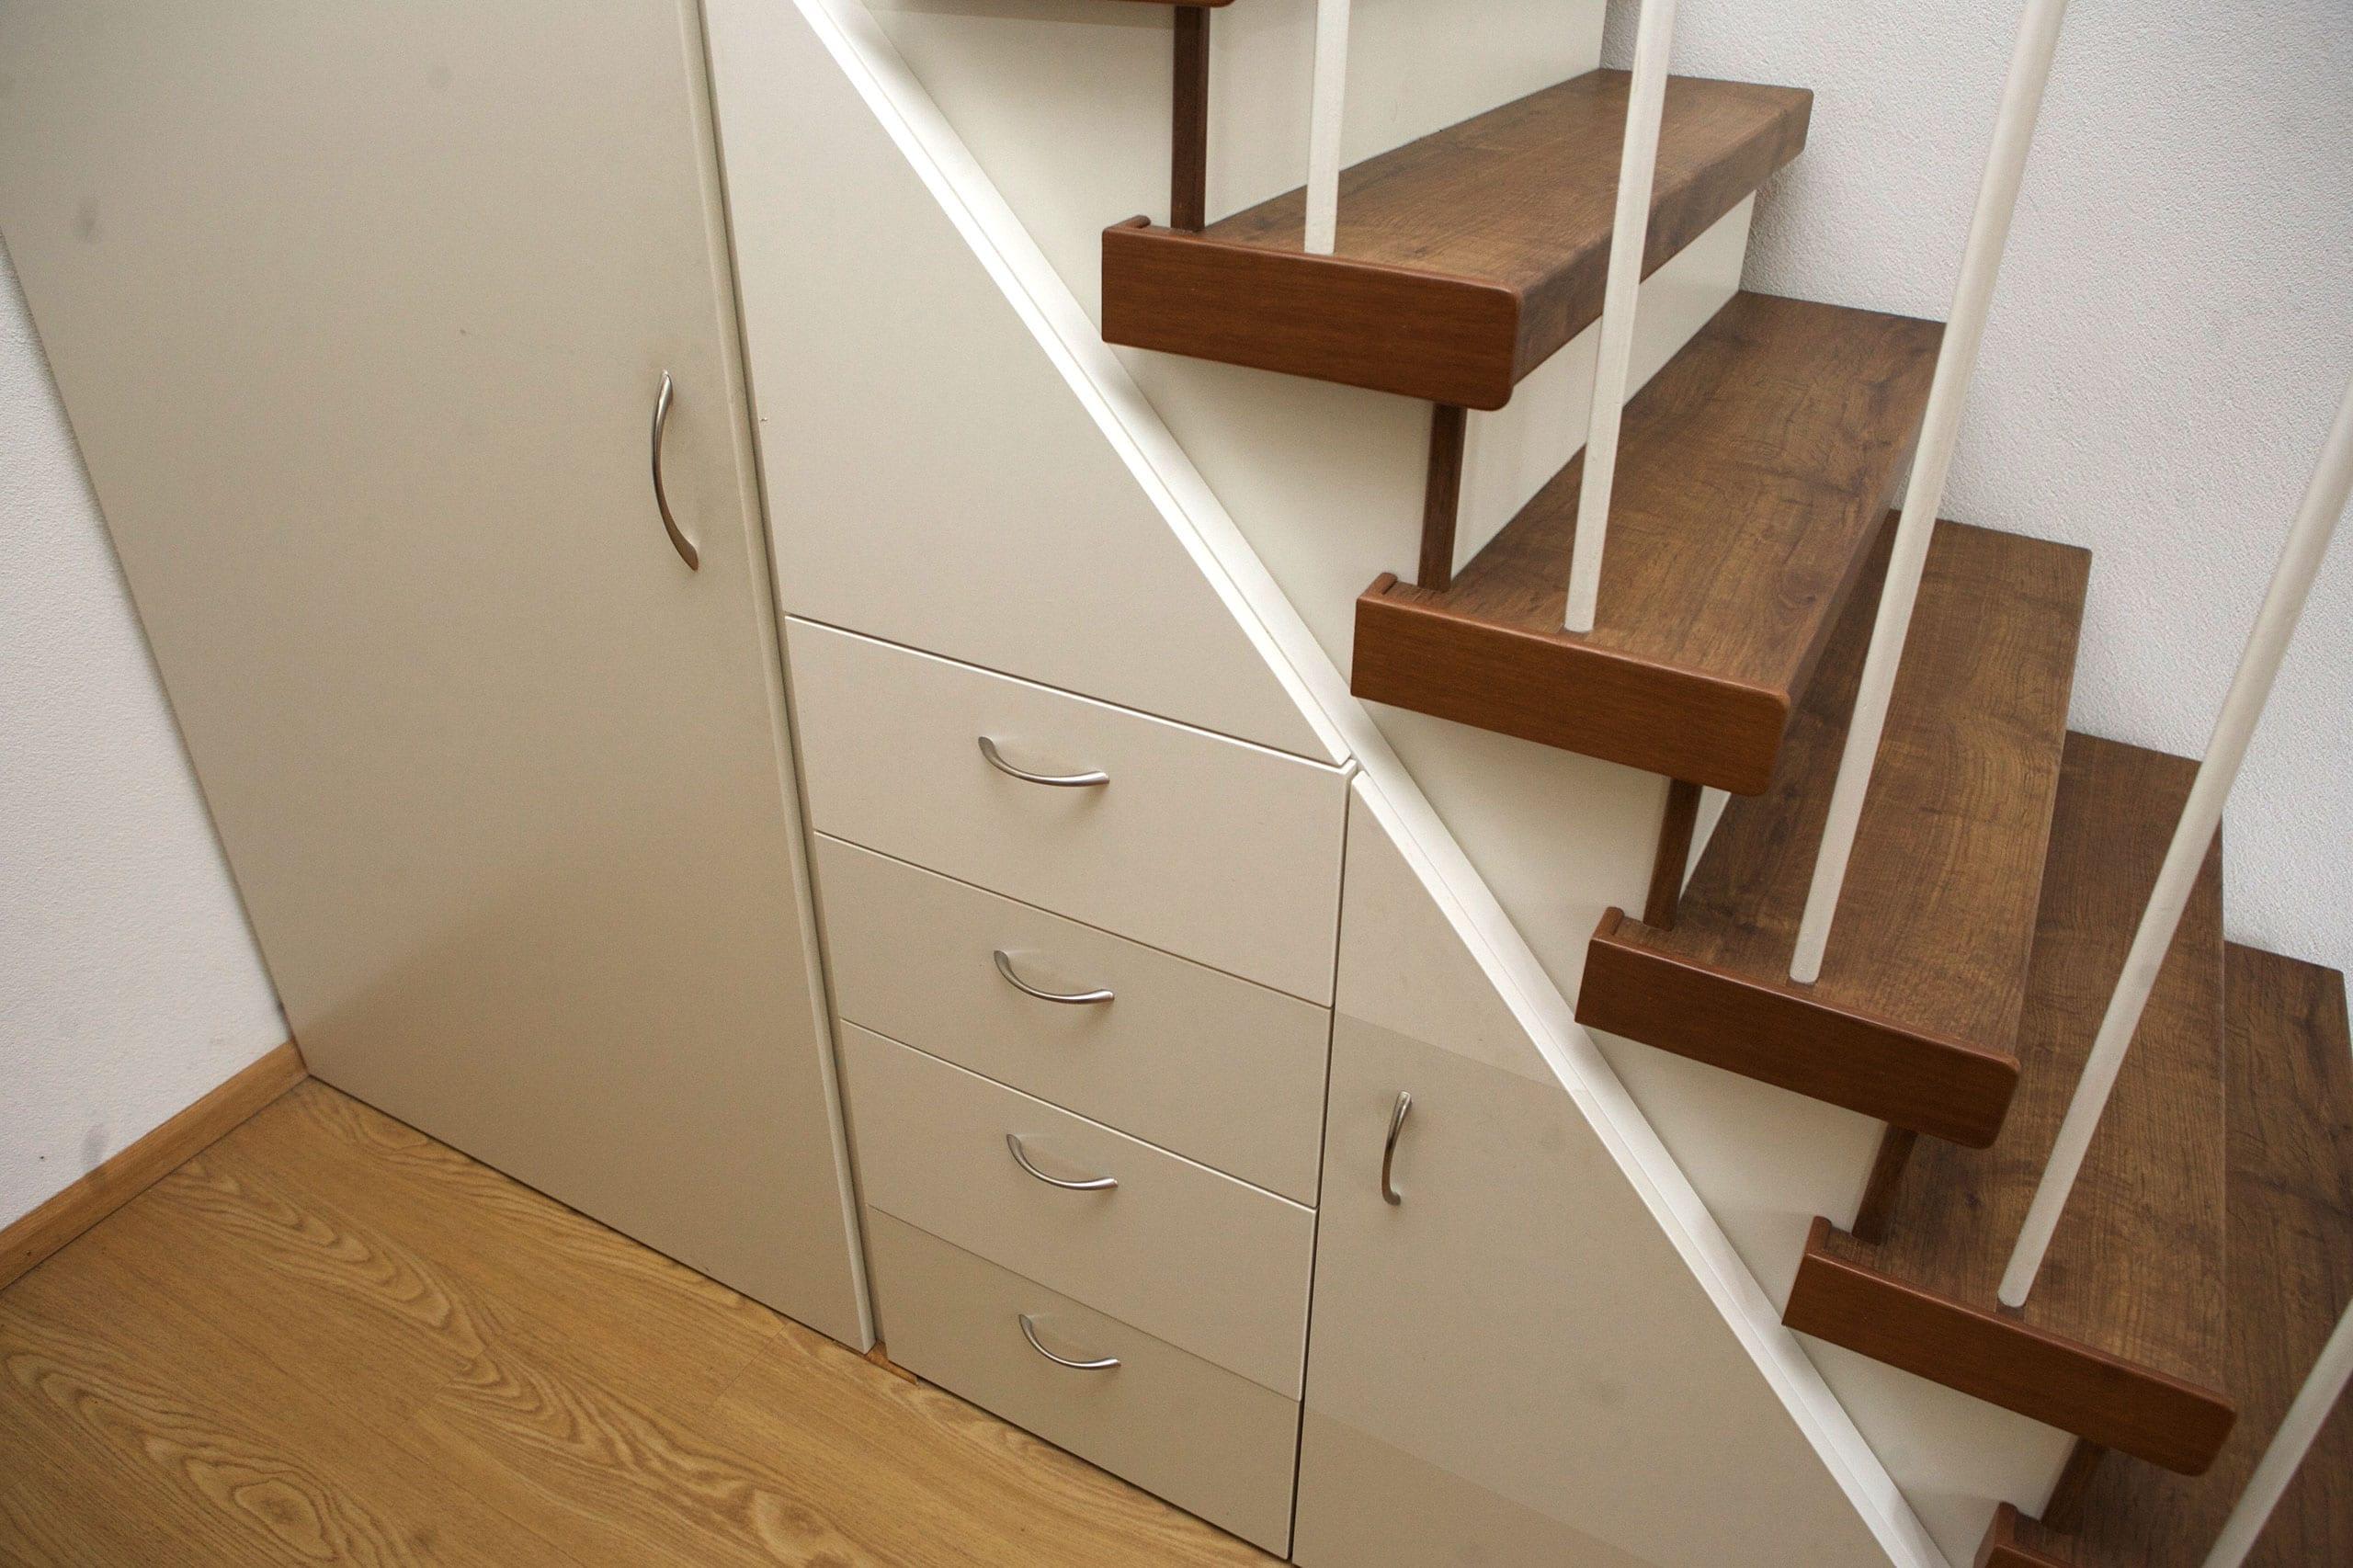 trapkast-ontwerp-op-maat-1